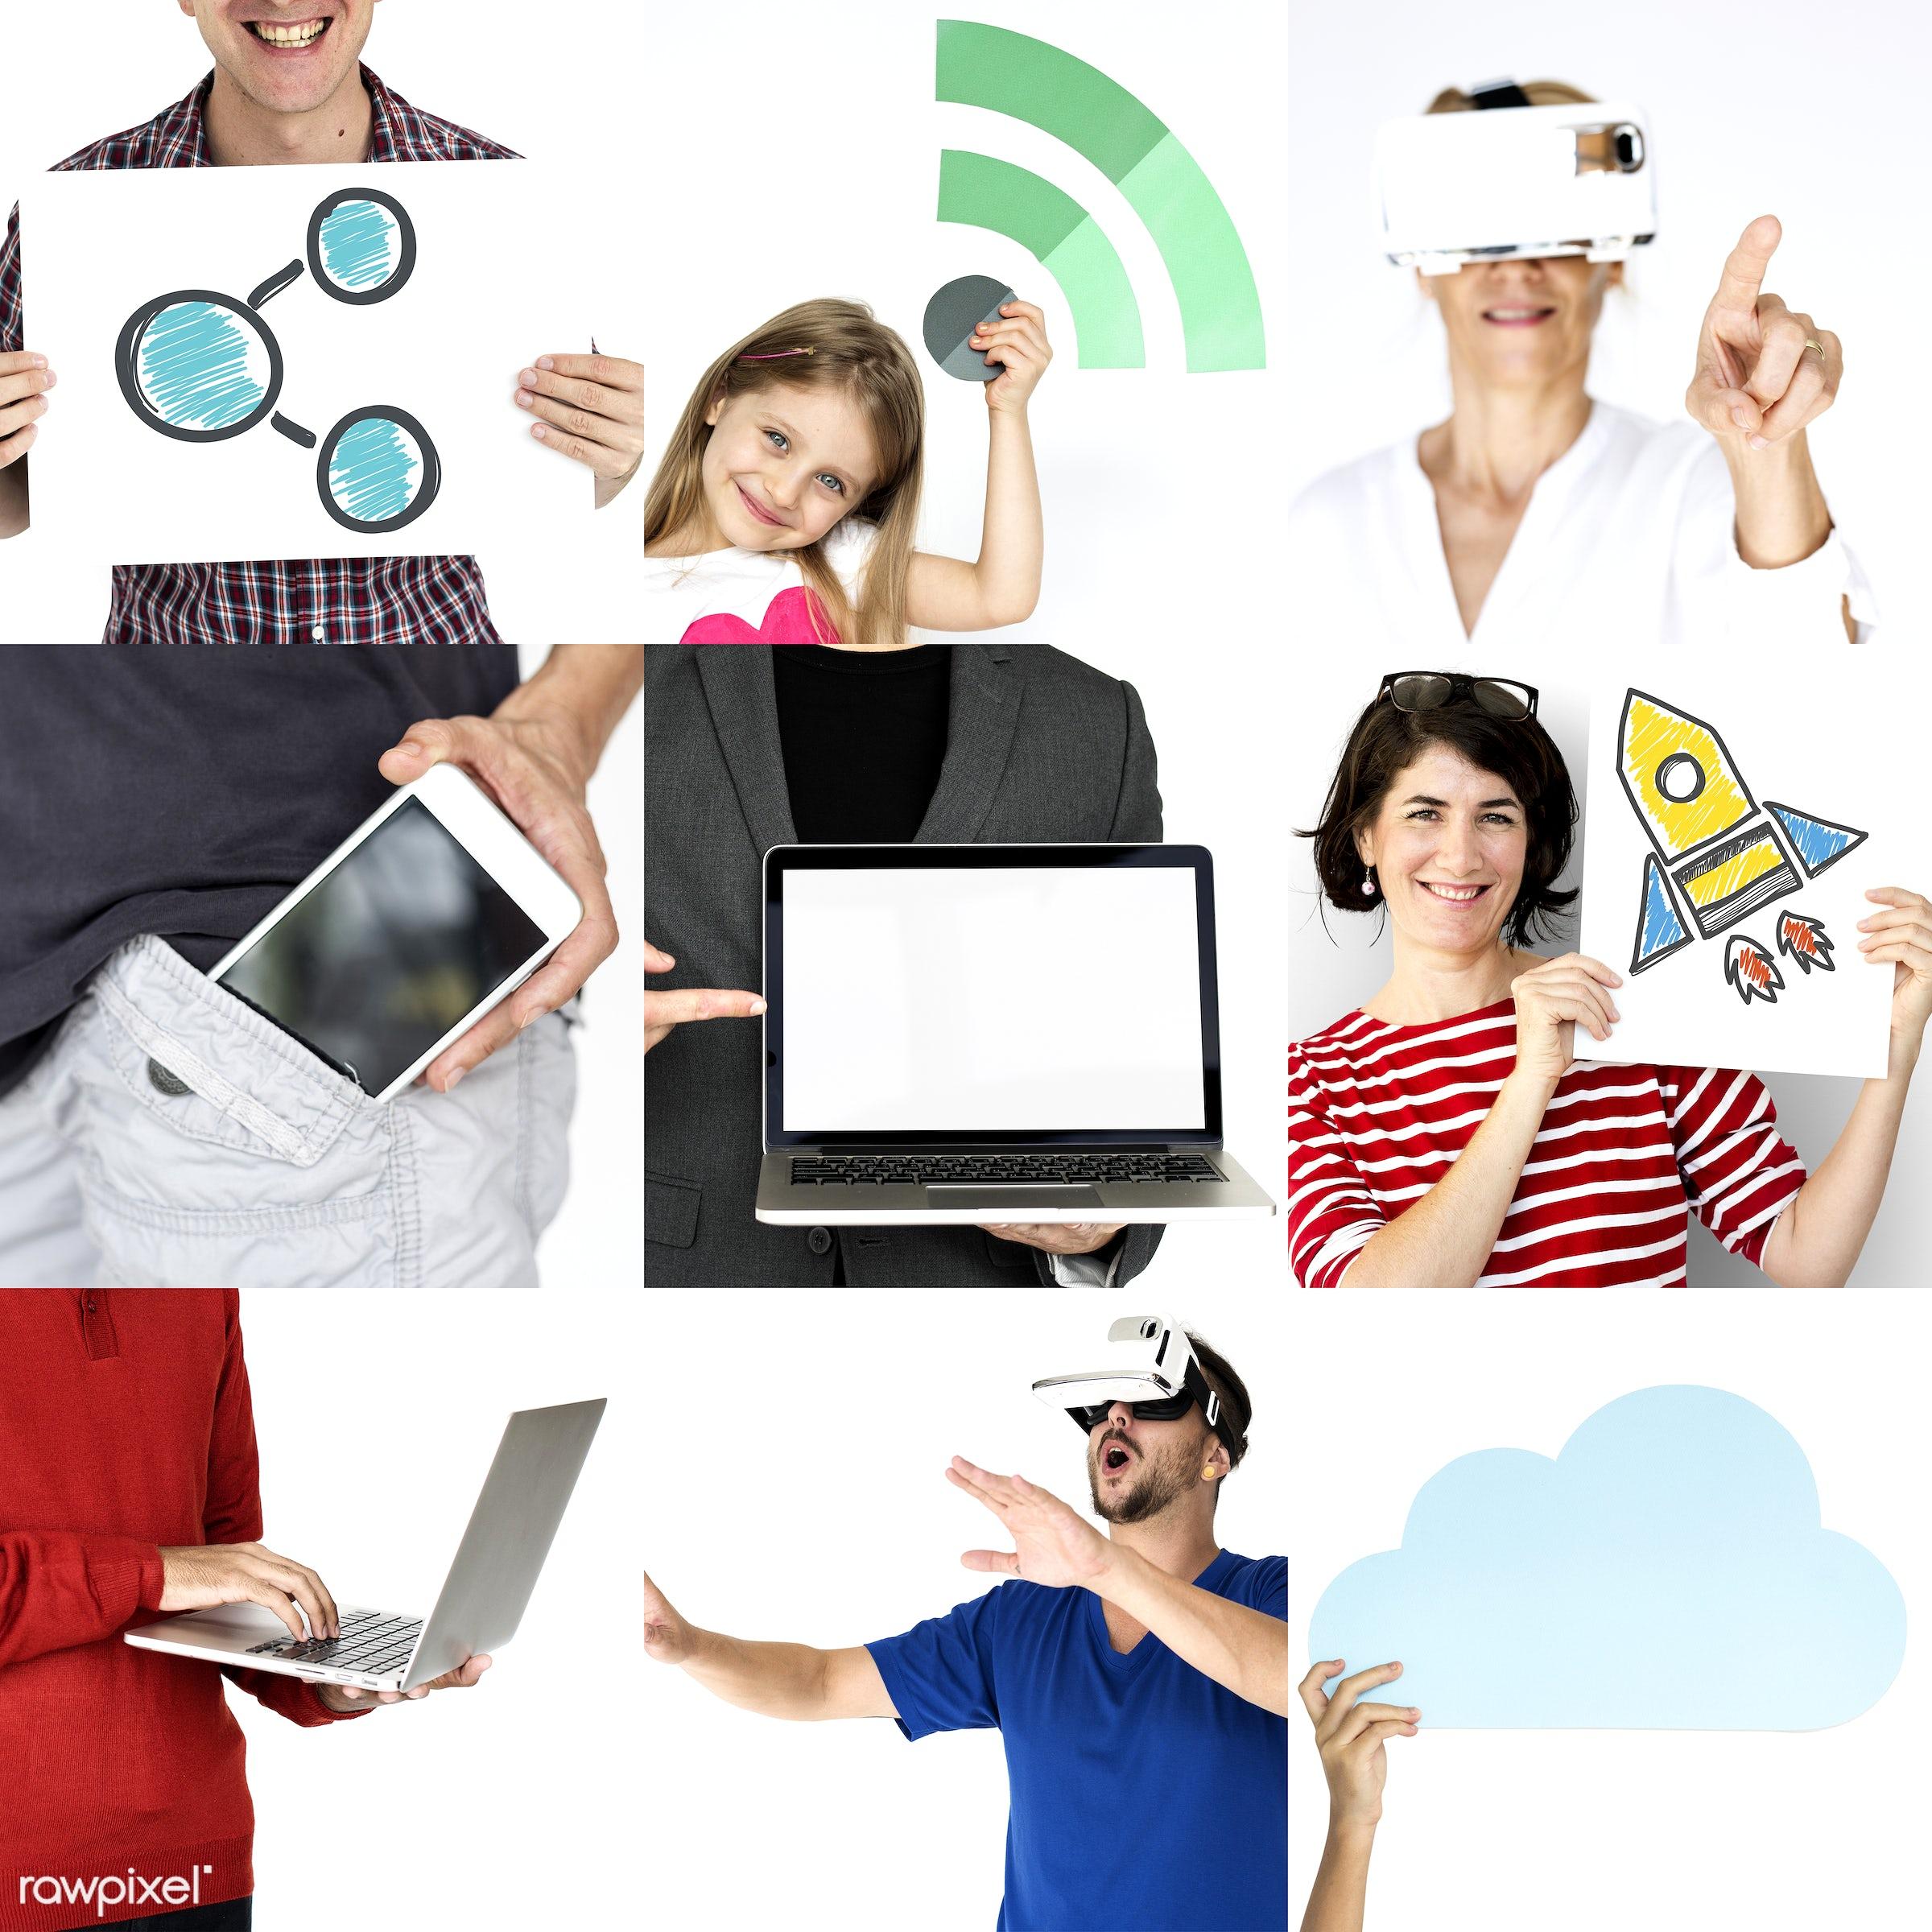 studio, using, person, phone, technology, download, people, kid, communicate, woman, lifestyle, laptop, studio squareset,...